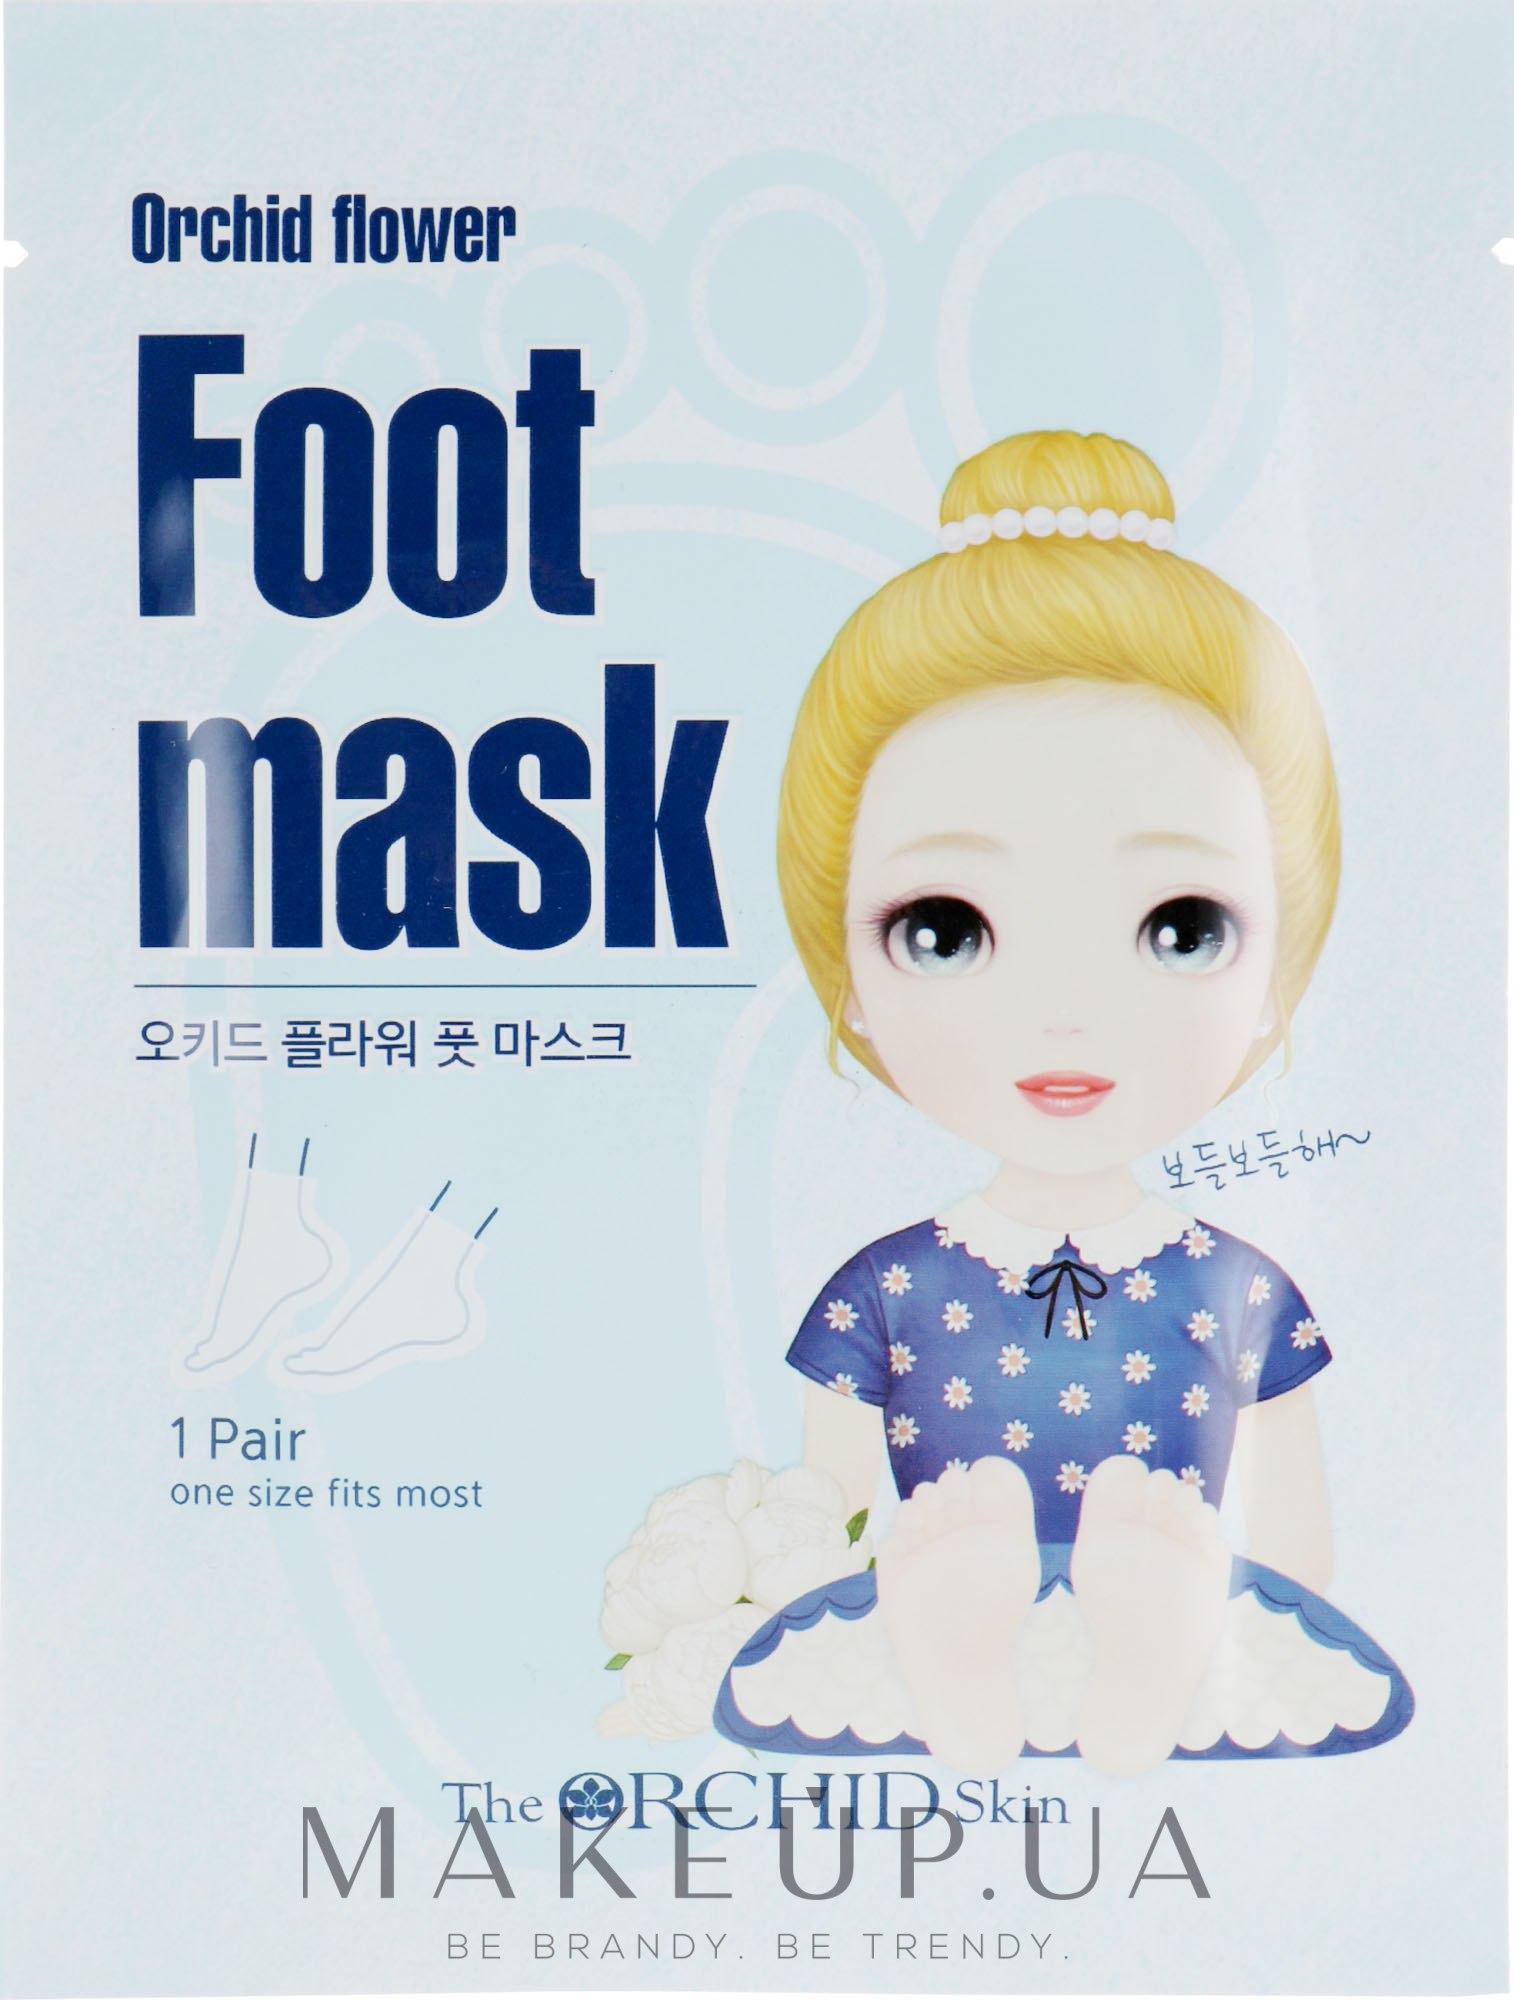 Тканевая маска для ступней - The Orchid Skin Orchid Flower Foot Mask Sheet — фото 18ml